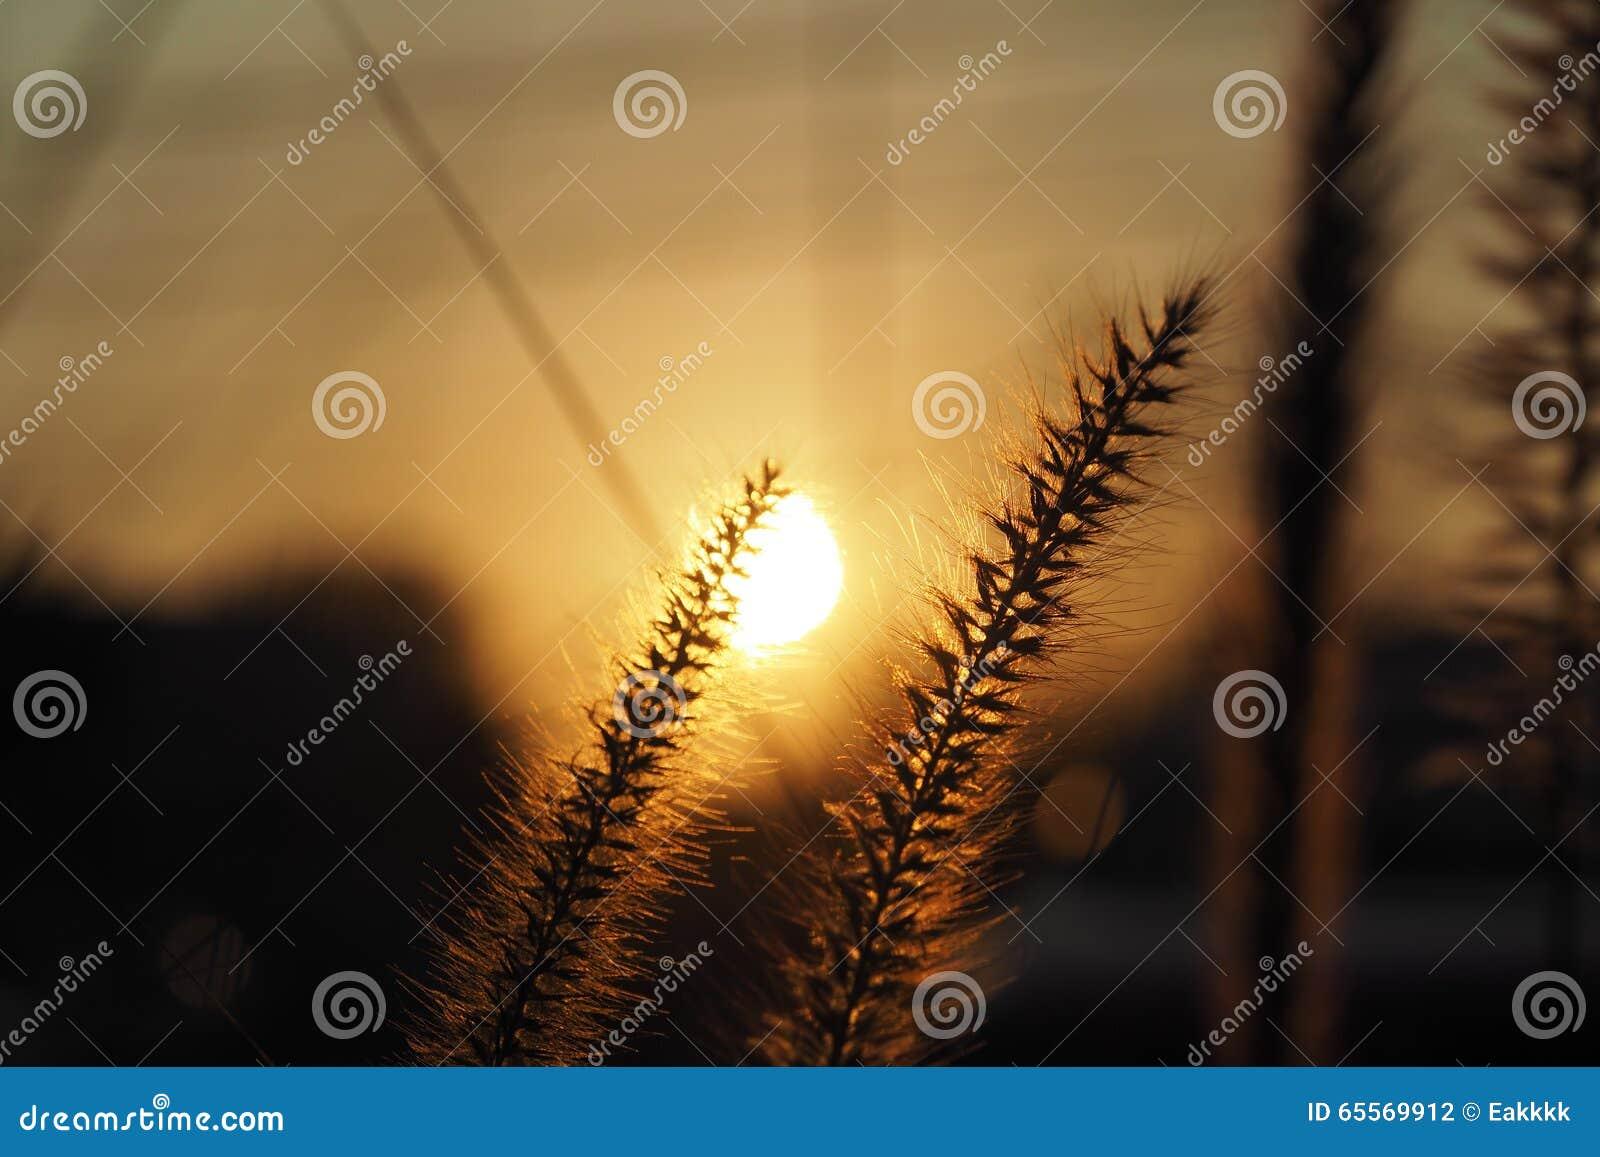 Sunset/Grass flower with sunset light background